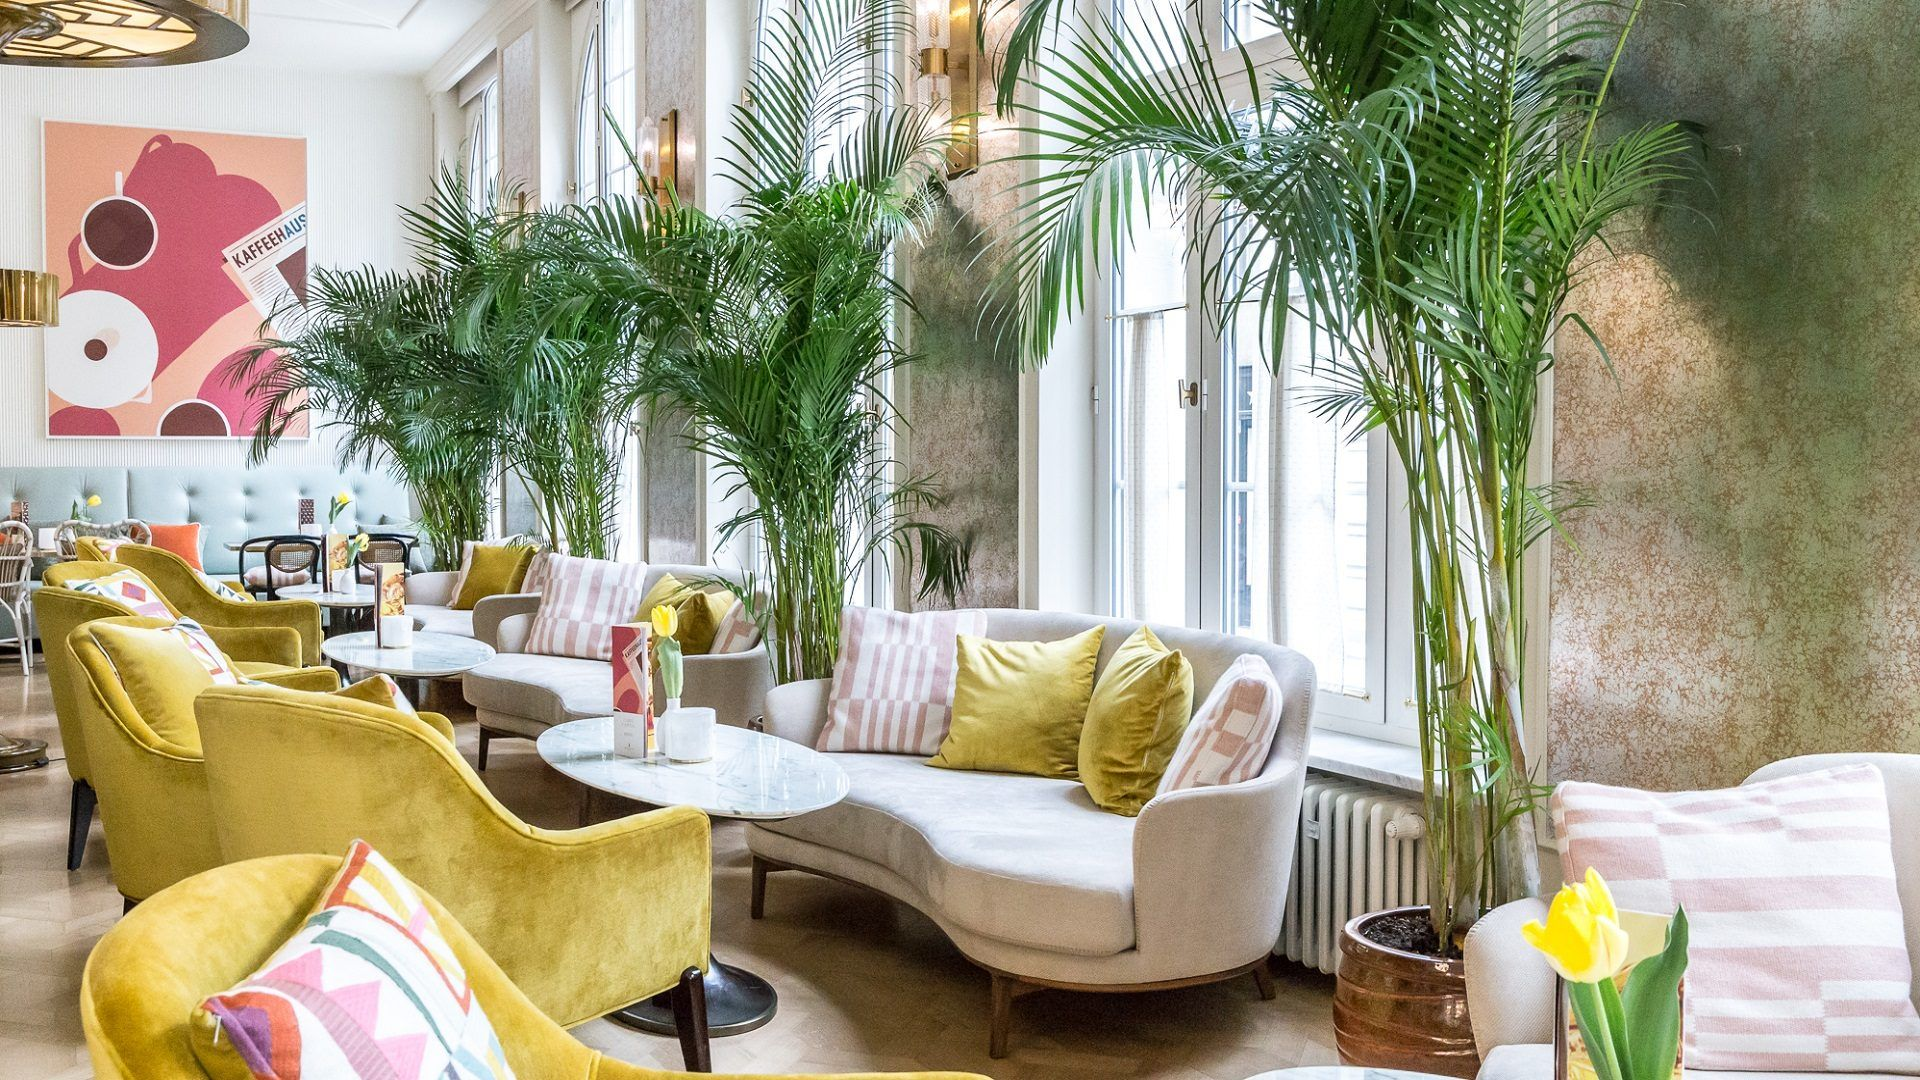 Amadria Park Zagreb Hotel In Croatia Zagreb Floral Living Room Inspiration Hotel Heritage Hotel Majestic Hotel